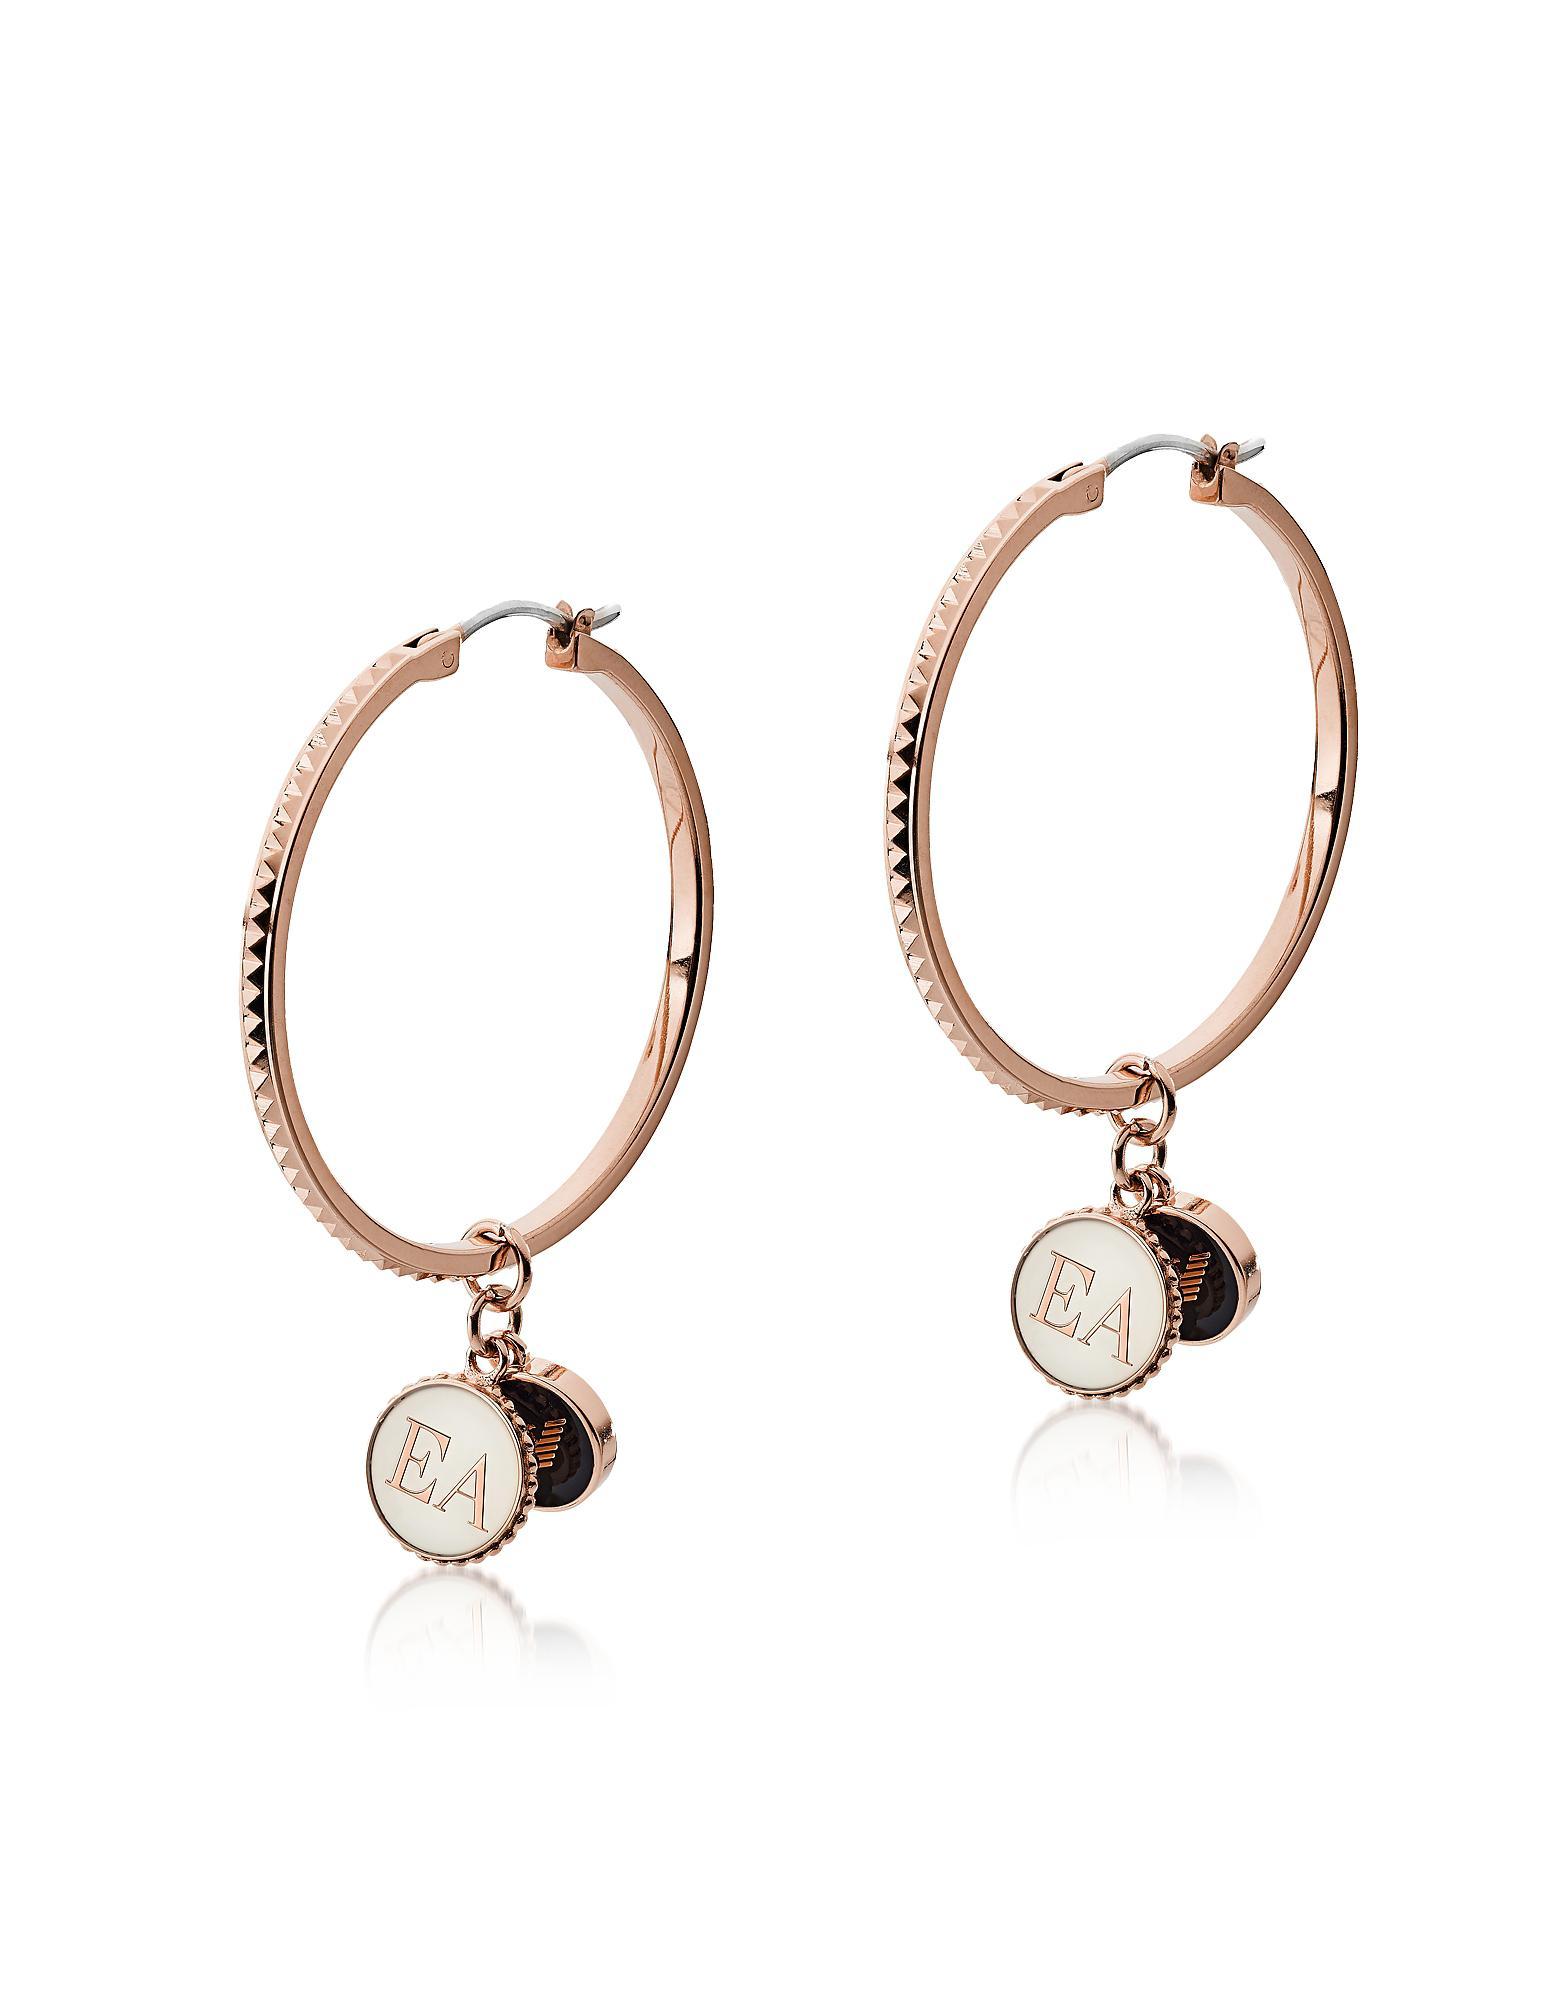 ea53b65c Lyst - Emporio Armani Egs2584221 - Women's Earring in Metallic